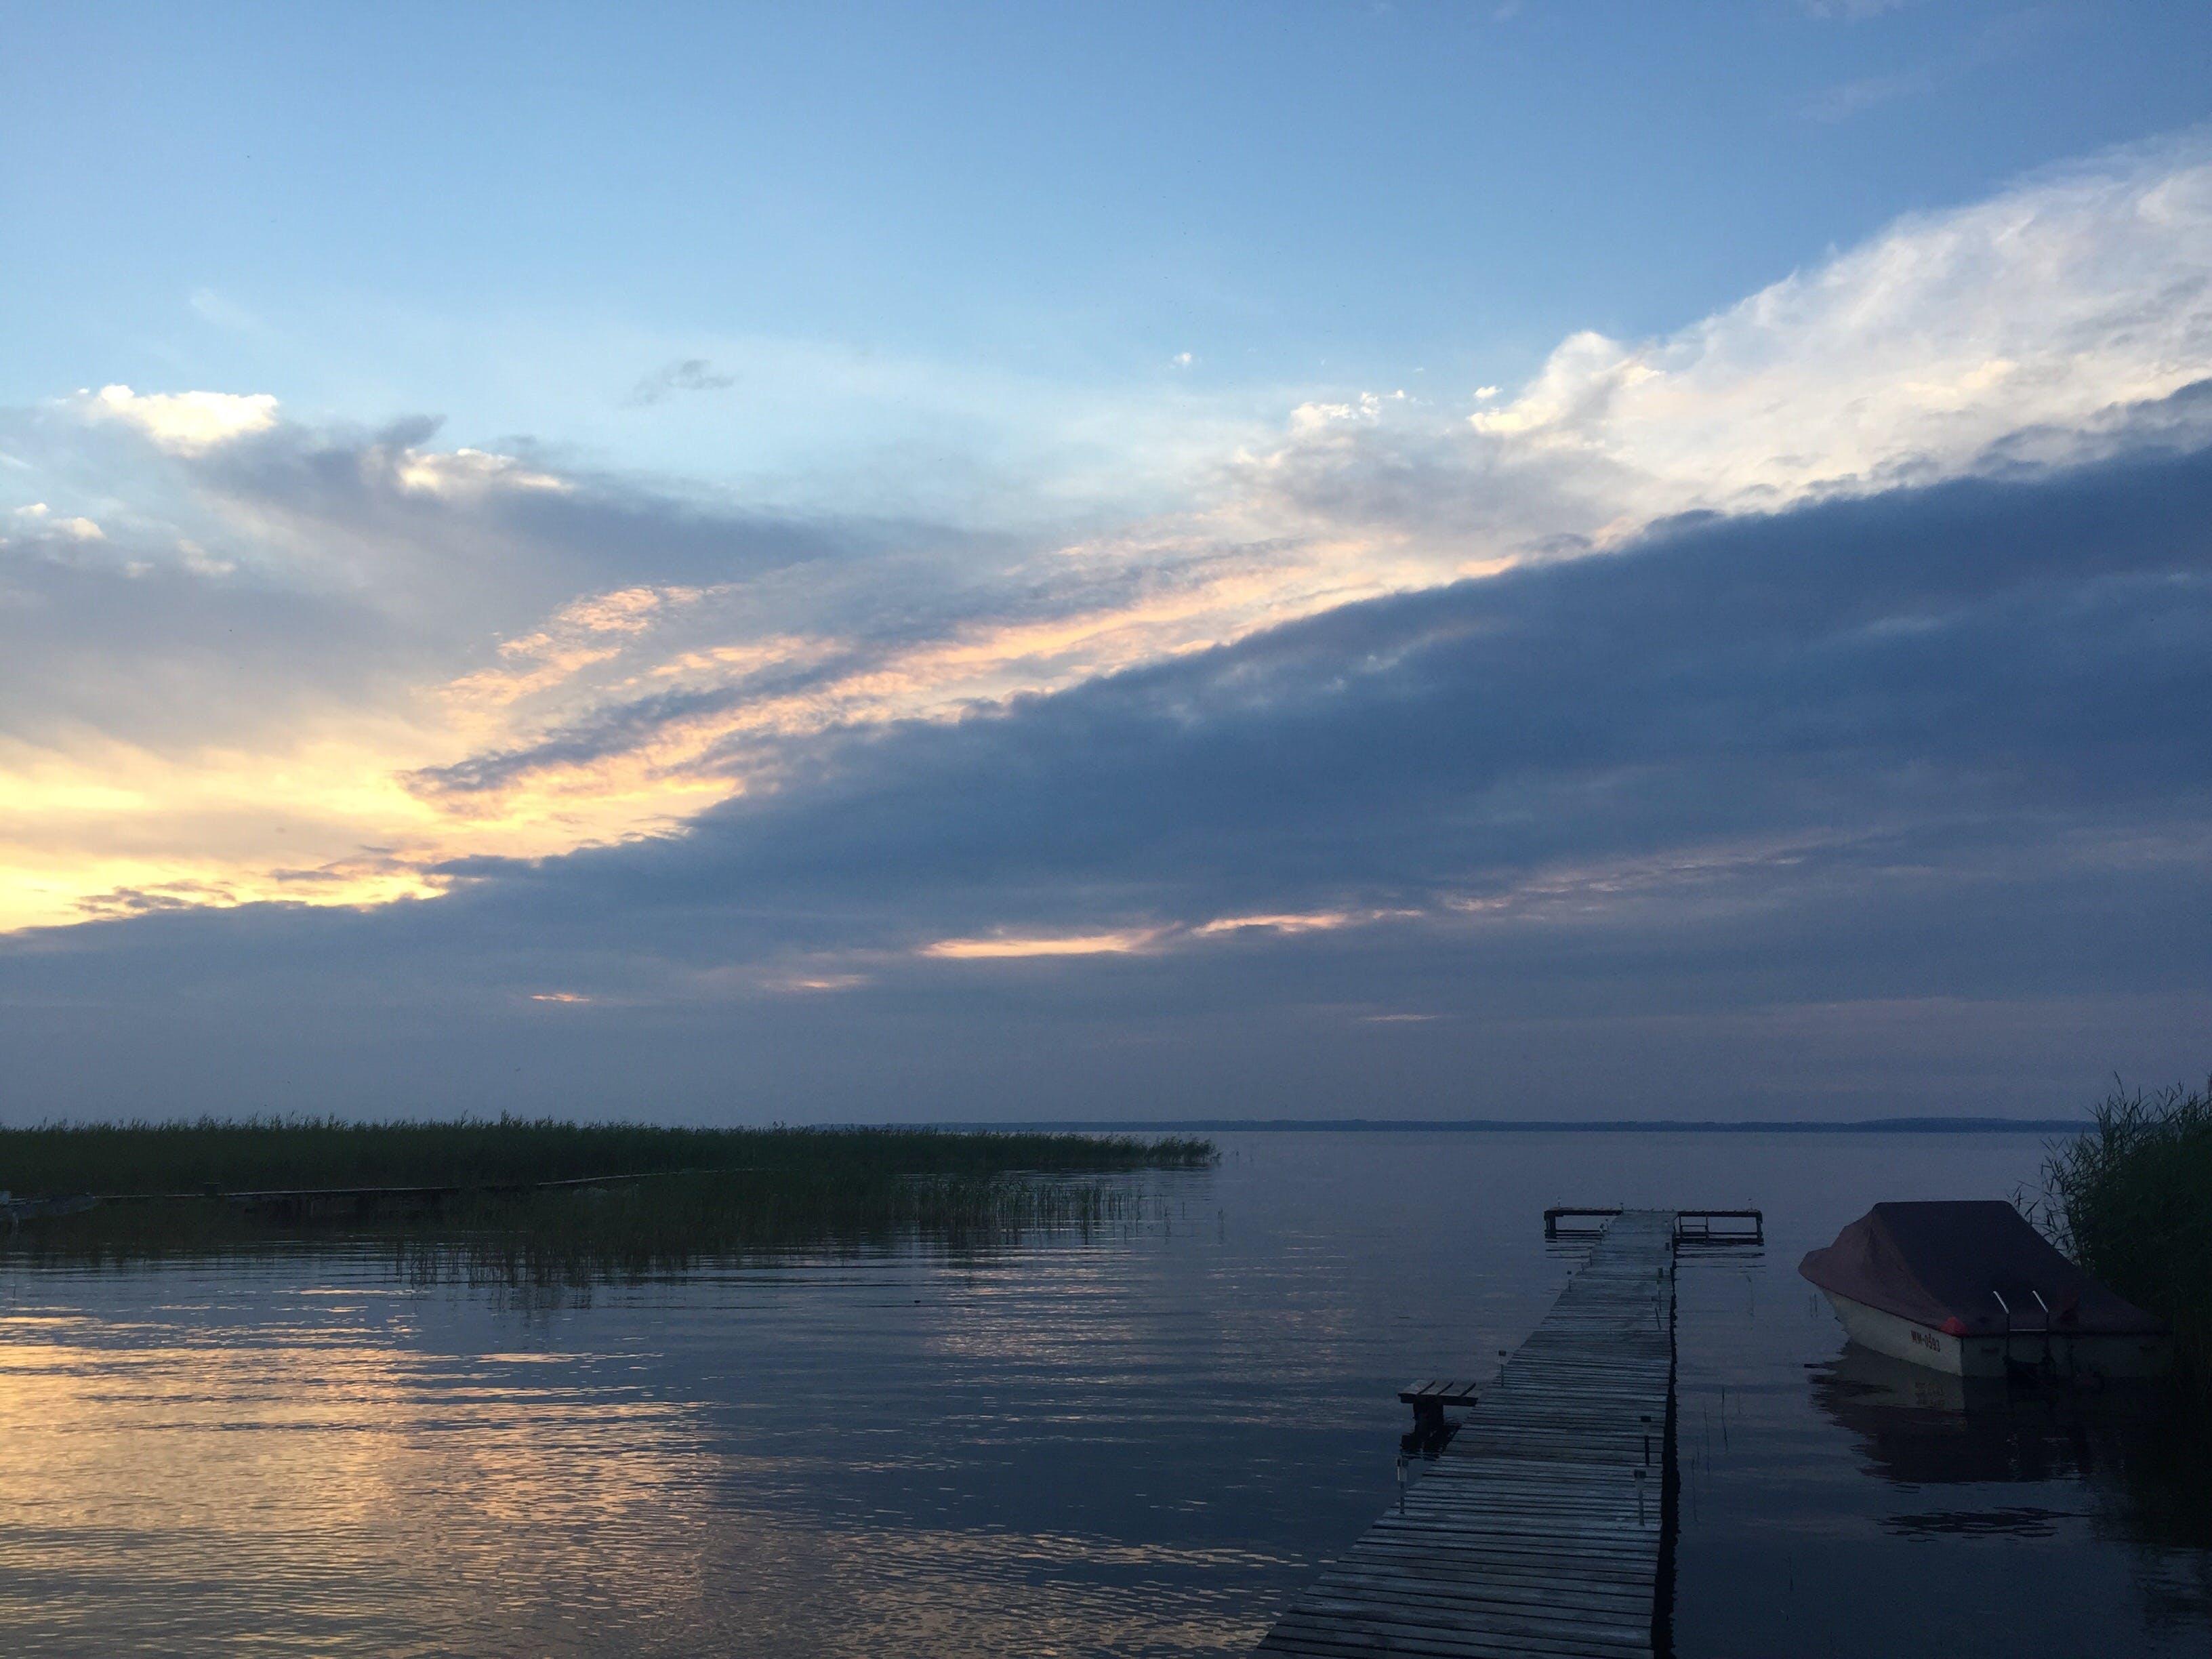 Free stock photo of empty, evening sky, lake, sunset